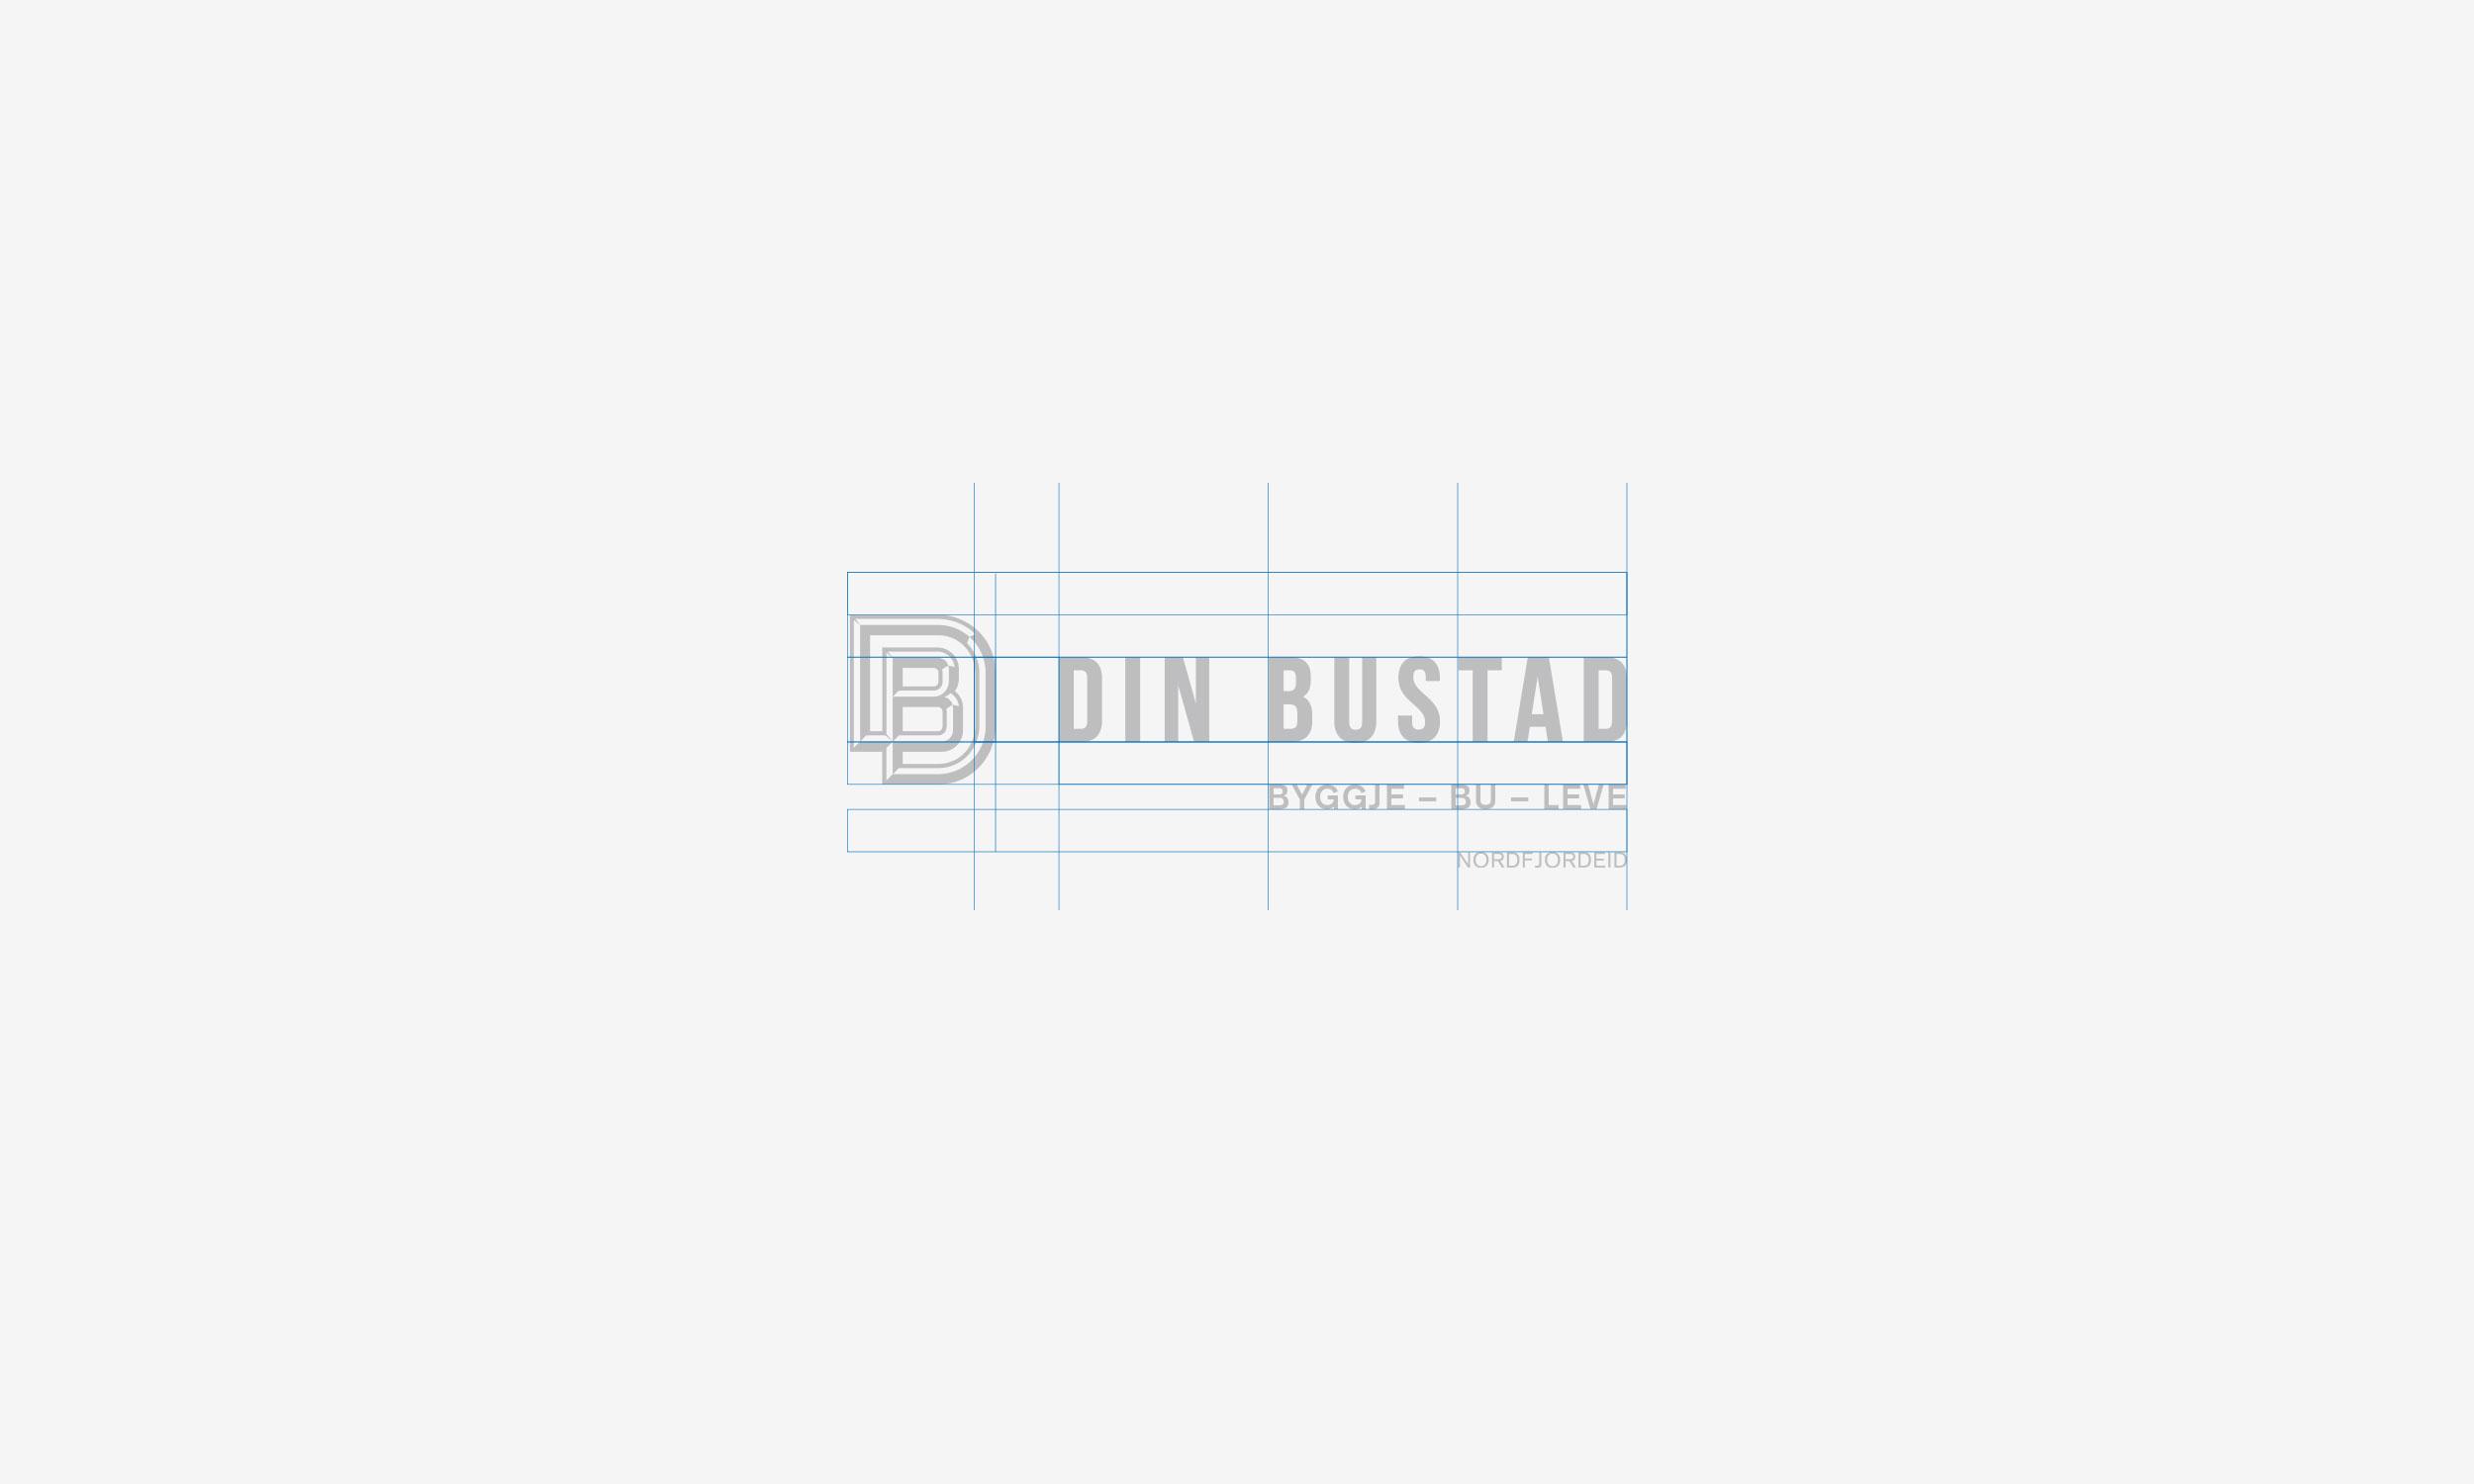 Din Bustad horizontal logo construction